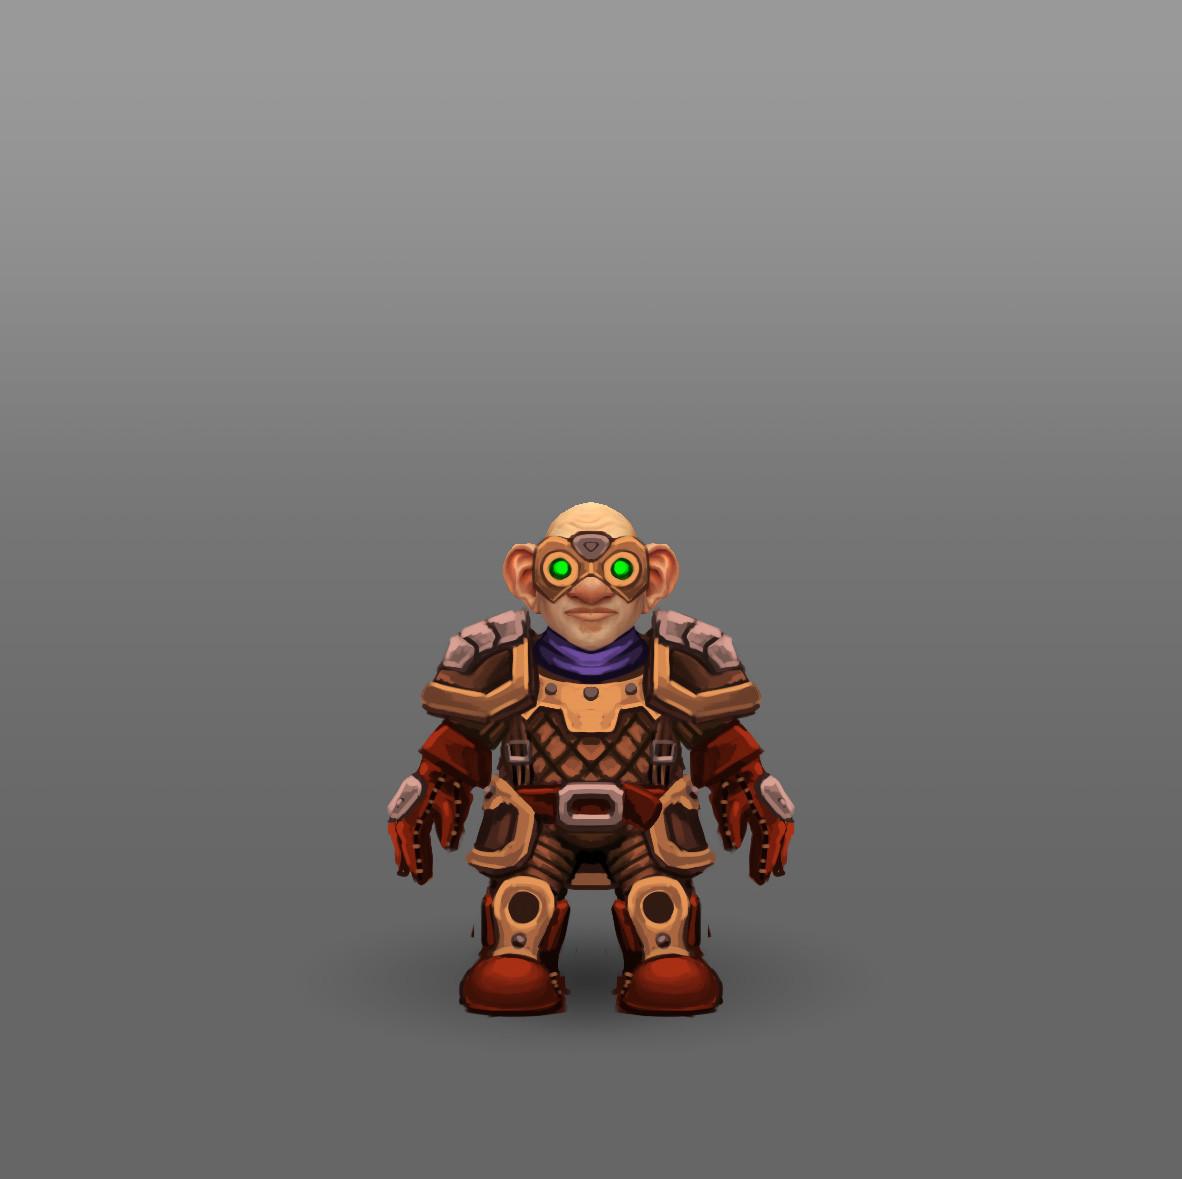 ArtStation - World of Warcraft - Racial Class Armor Design